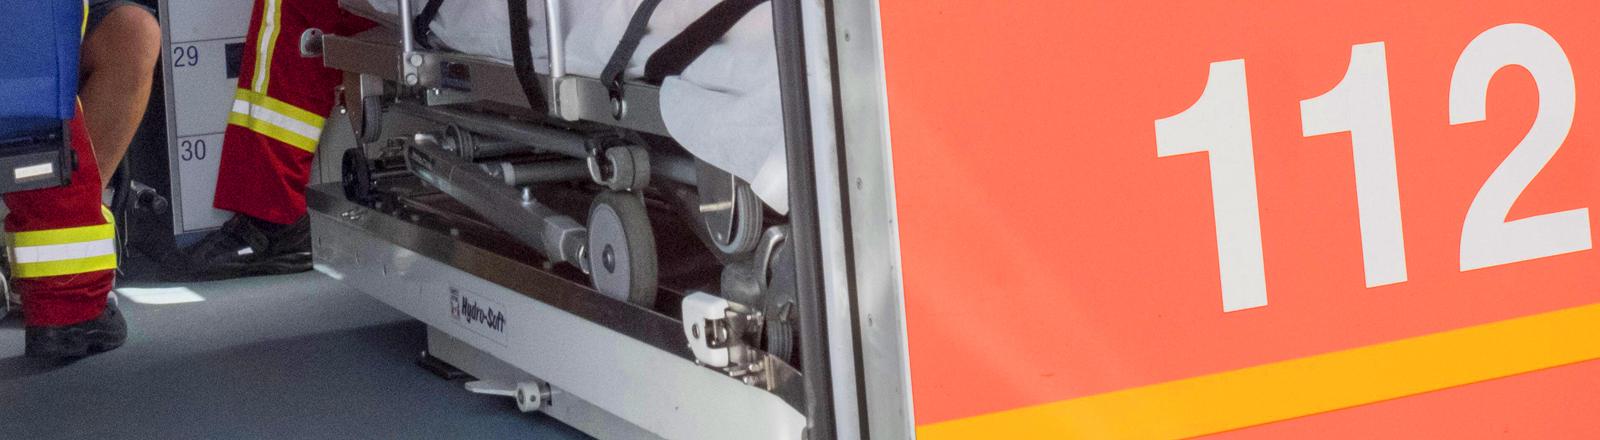 Rettungsauto